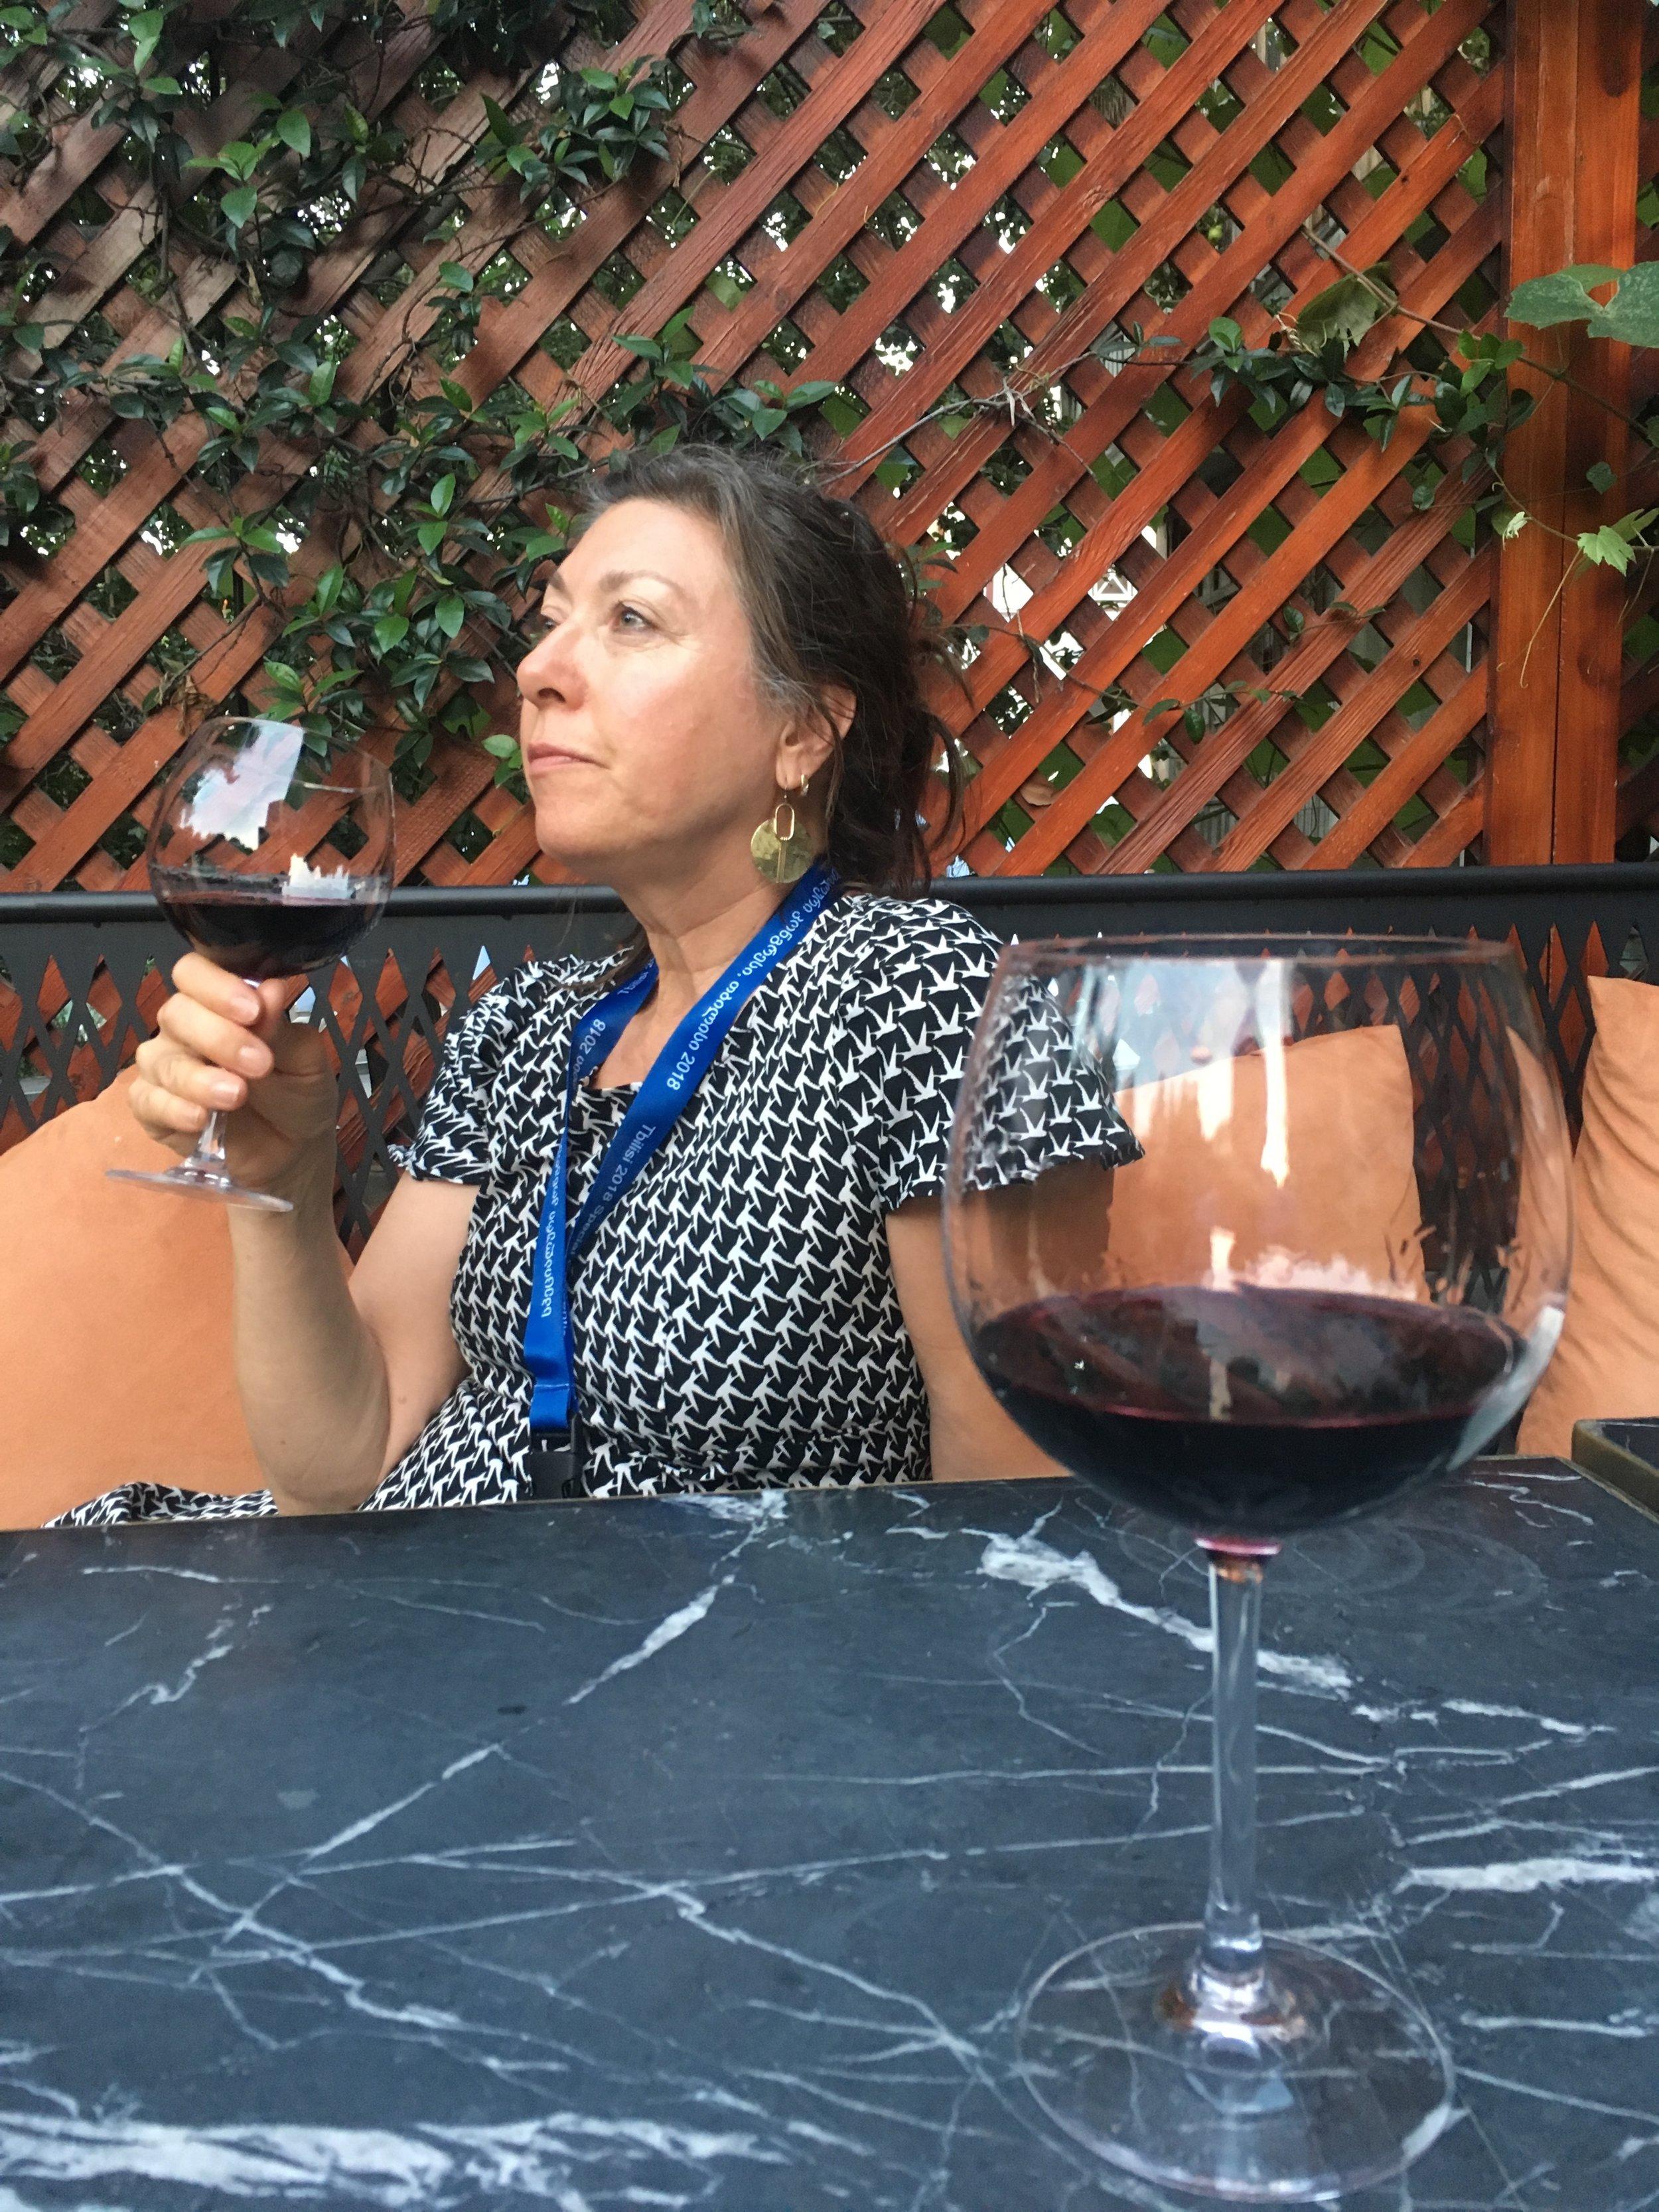 Jennette Bailey - Sales, Slake House beer & wine purchaser, mom, realist